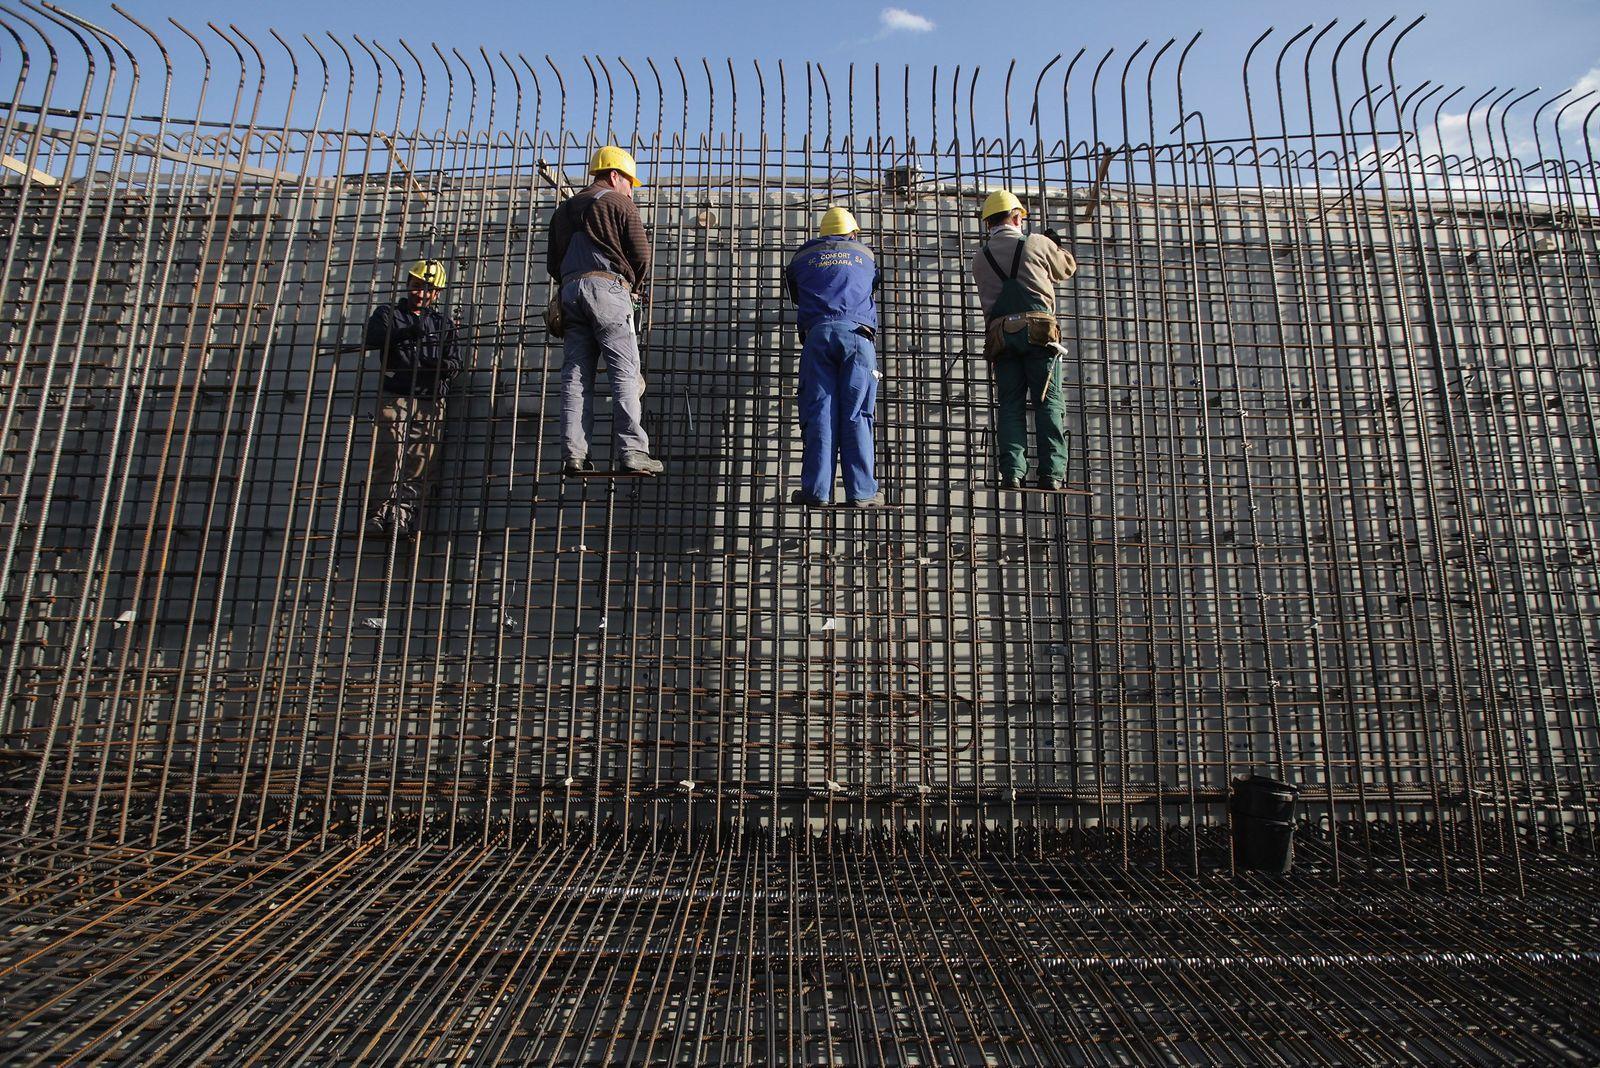 Baustelle/ Bauarbeiter